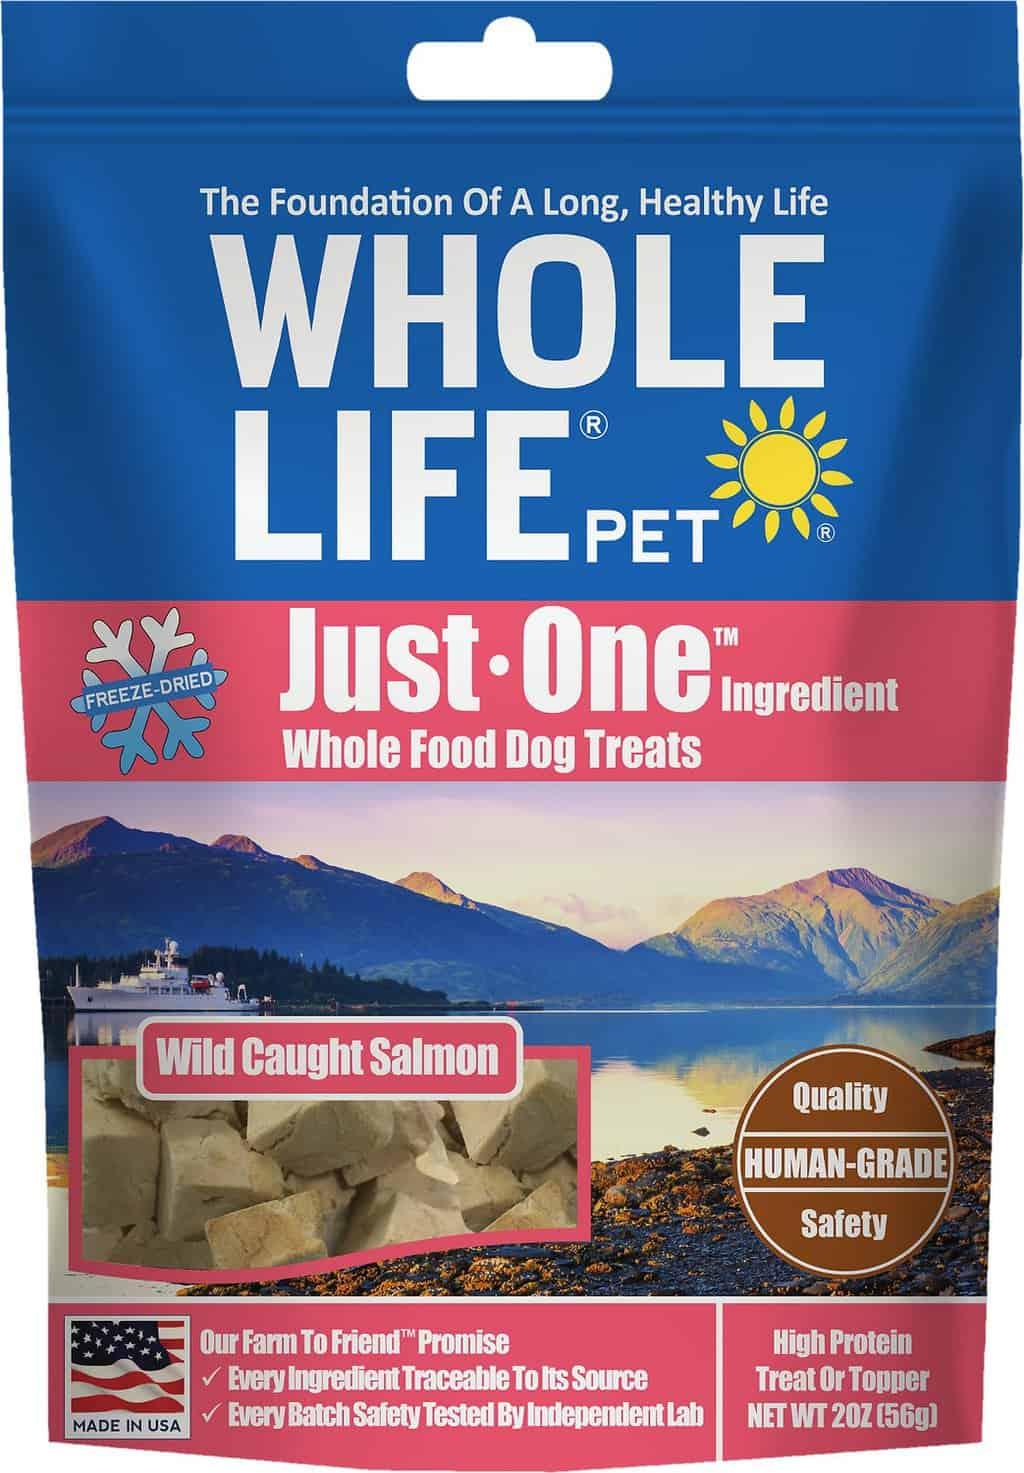 Whole Life Dog Food: 2020 Reviews, Recalls & Coupons 2